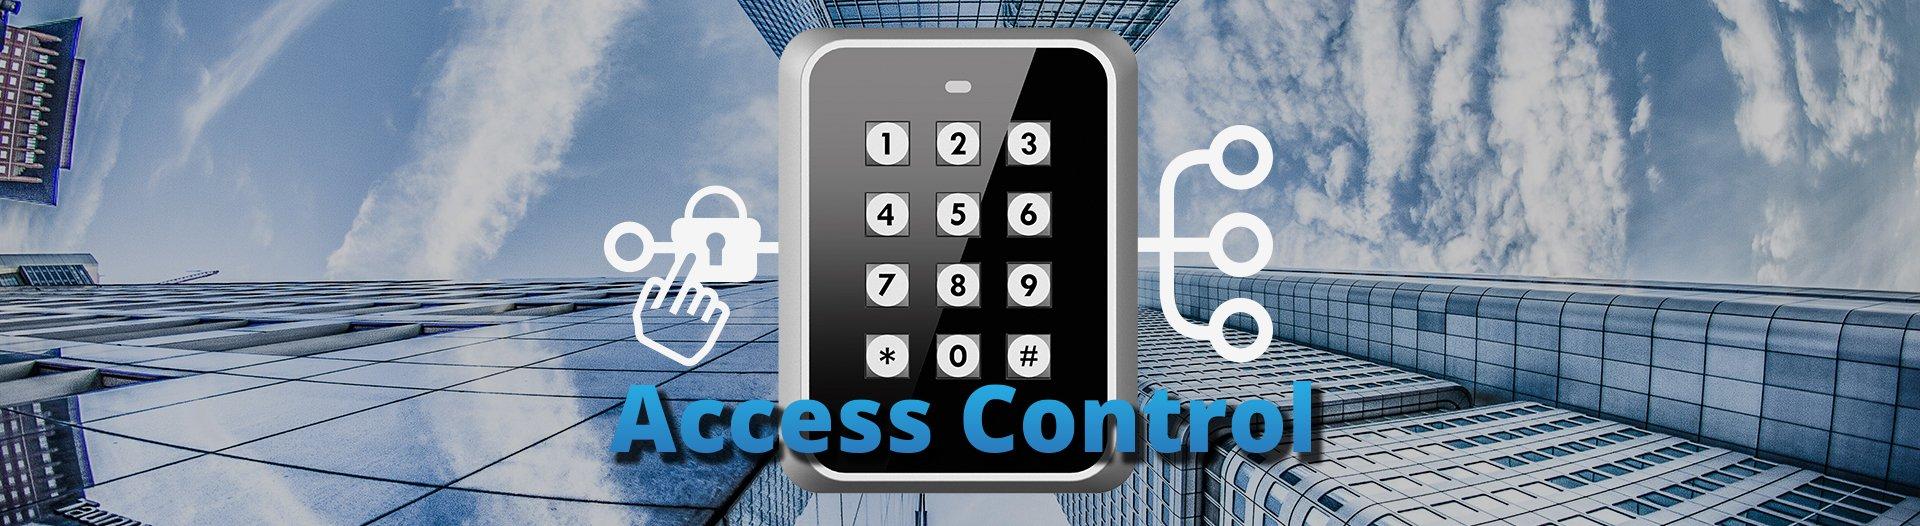 access-control-header2a